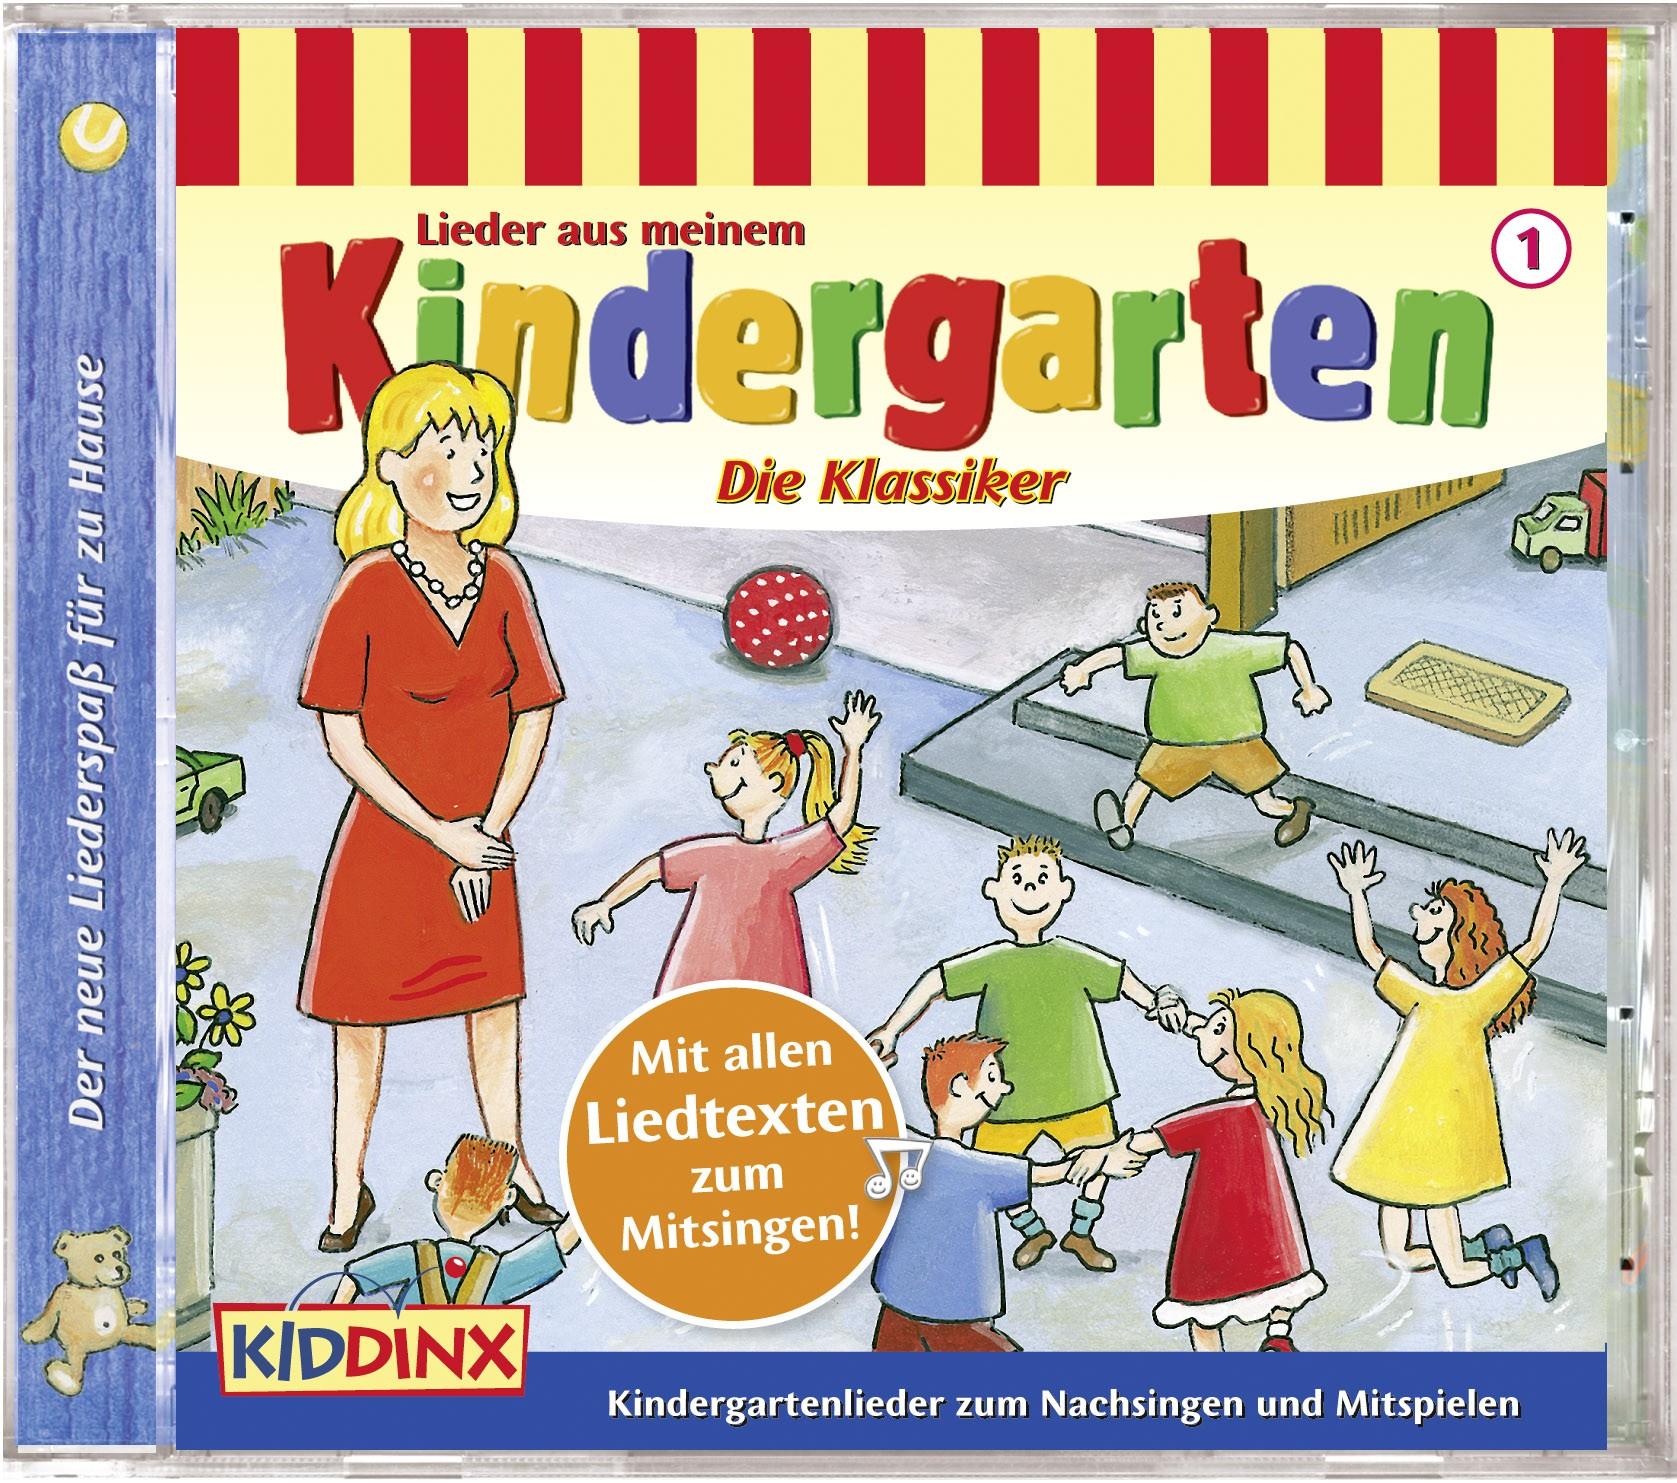 Lieder aus meinem Kindergarten: Die Klassiker (Folge 1)